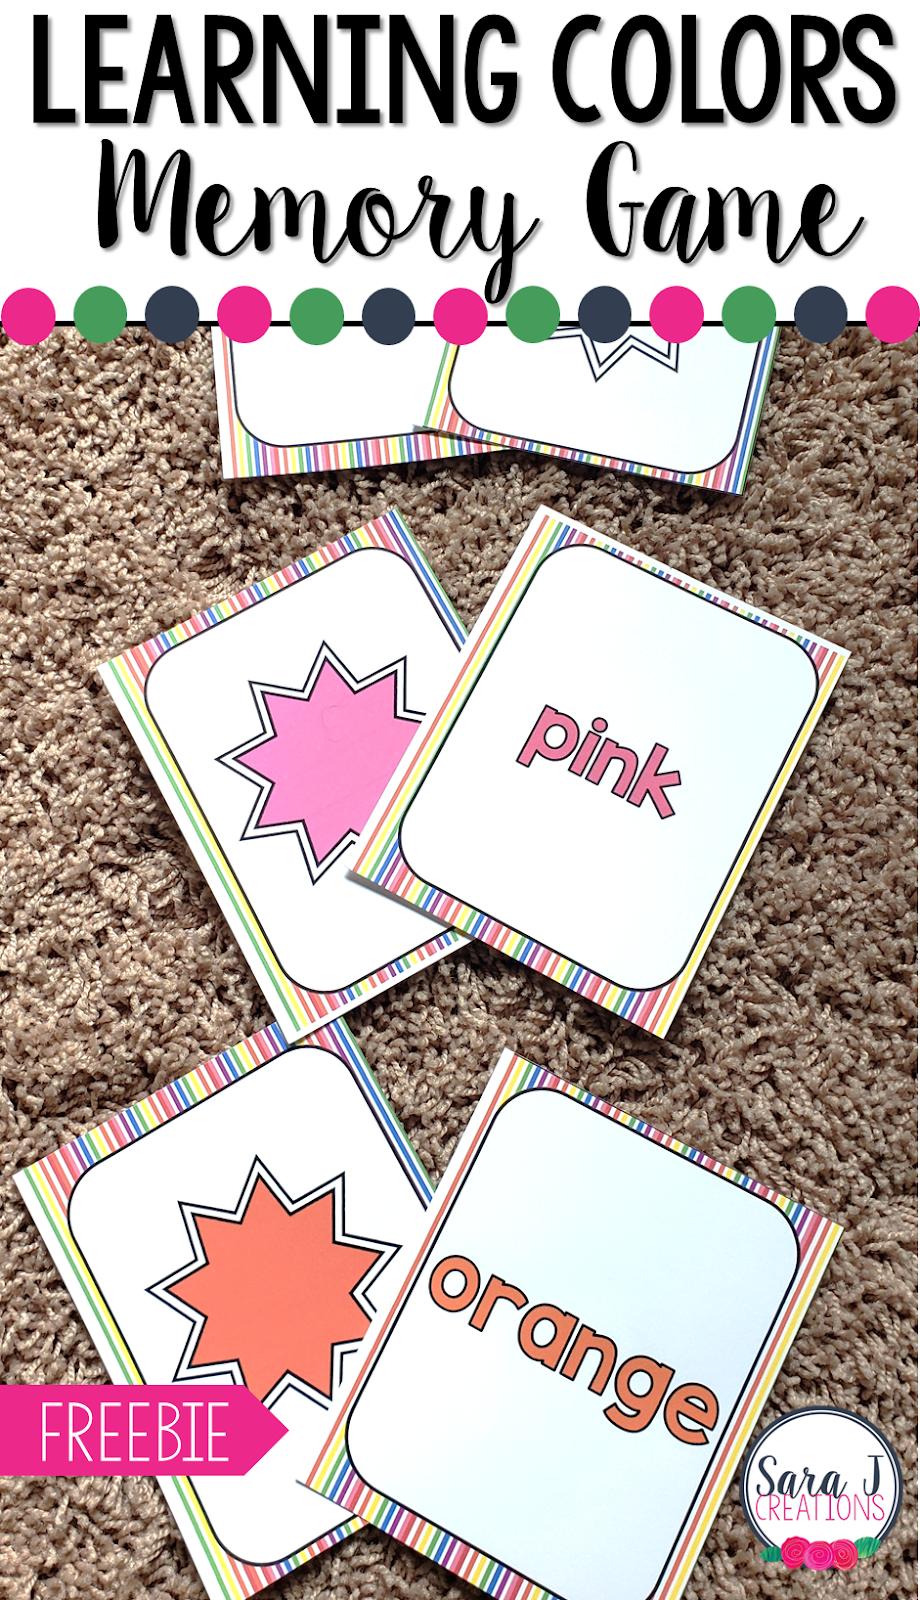 Learning Colors Memory Game | Sara J Creations